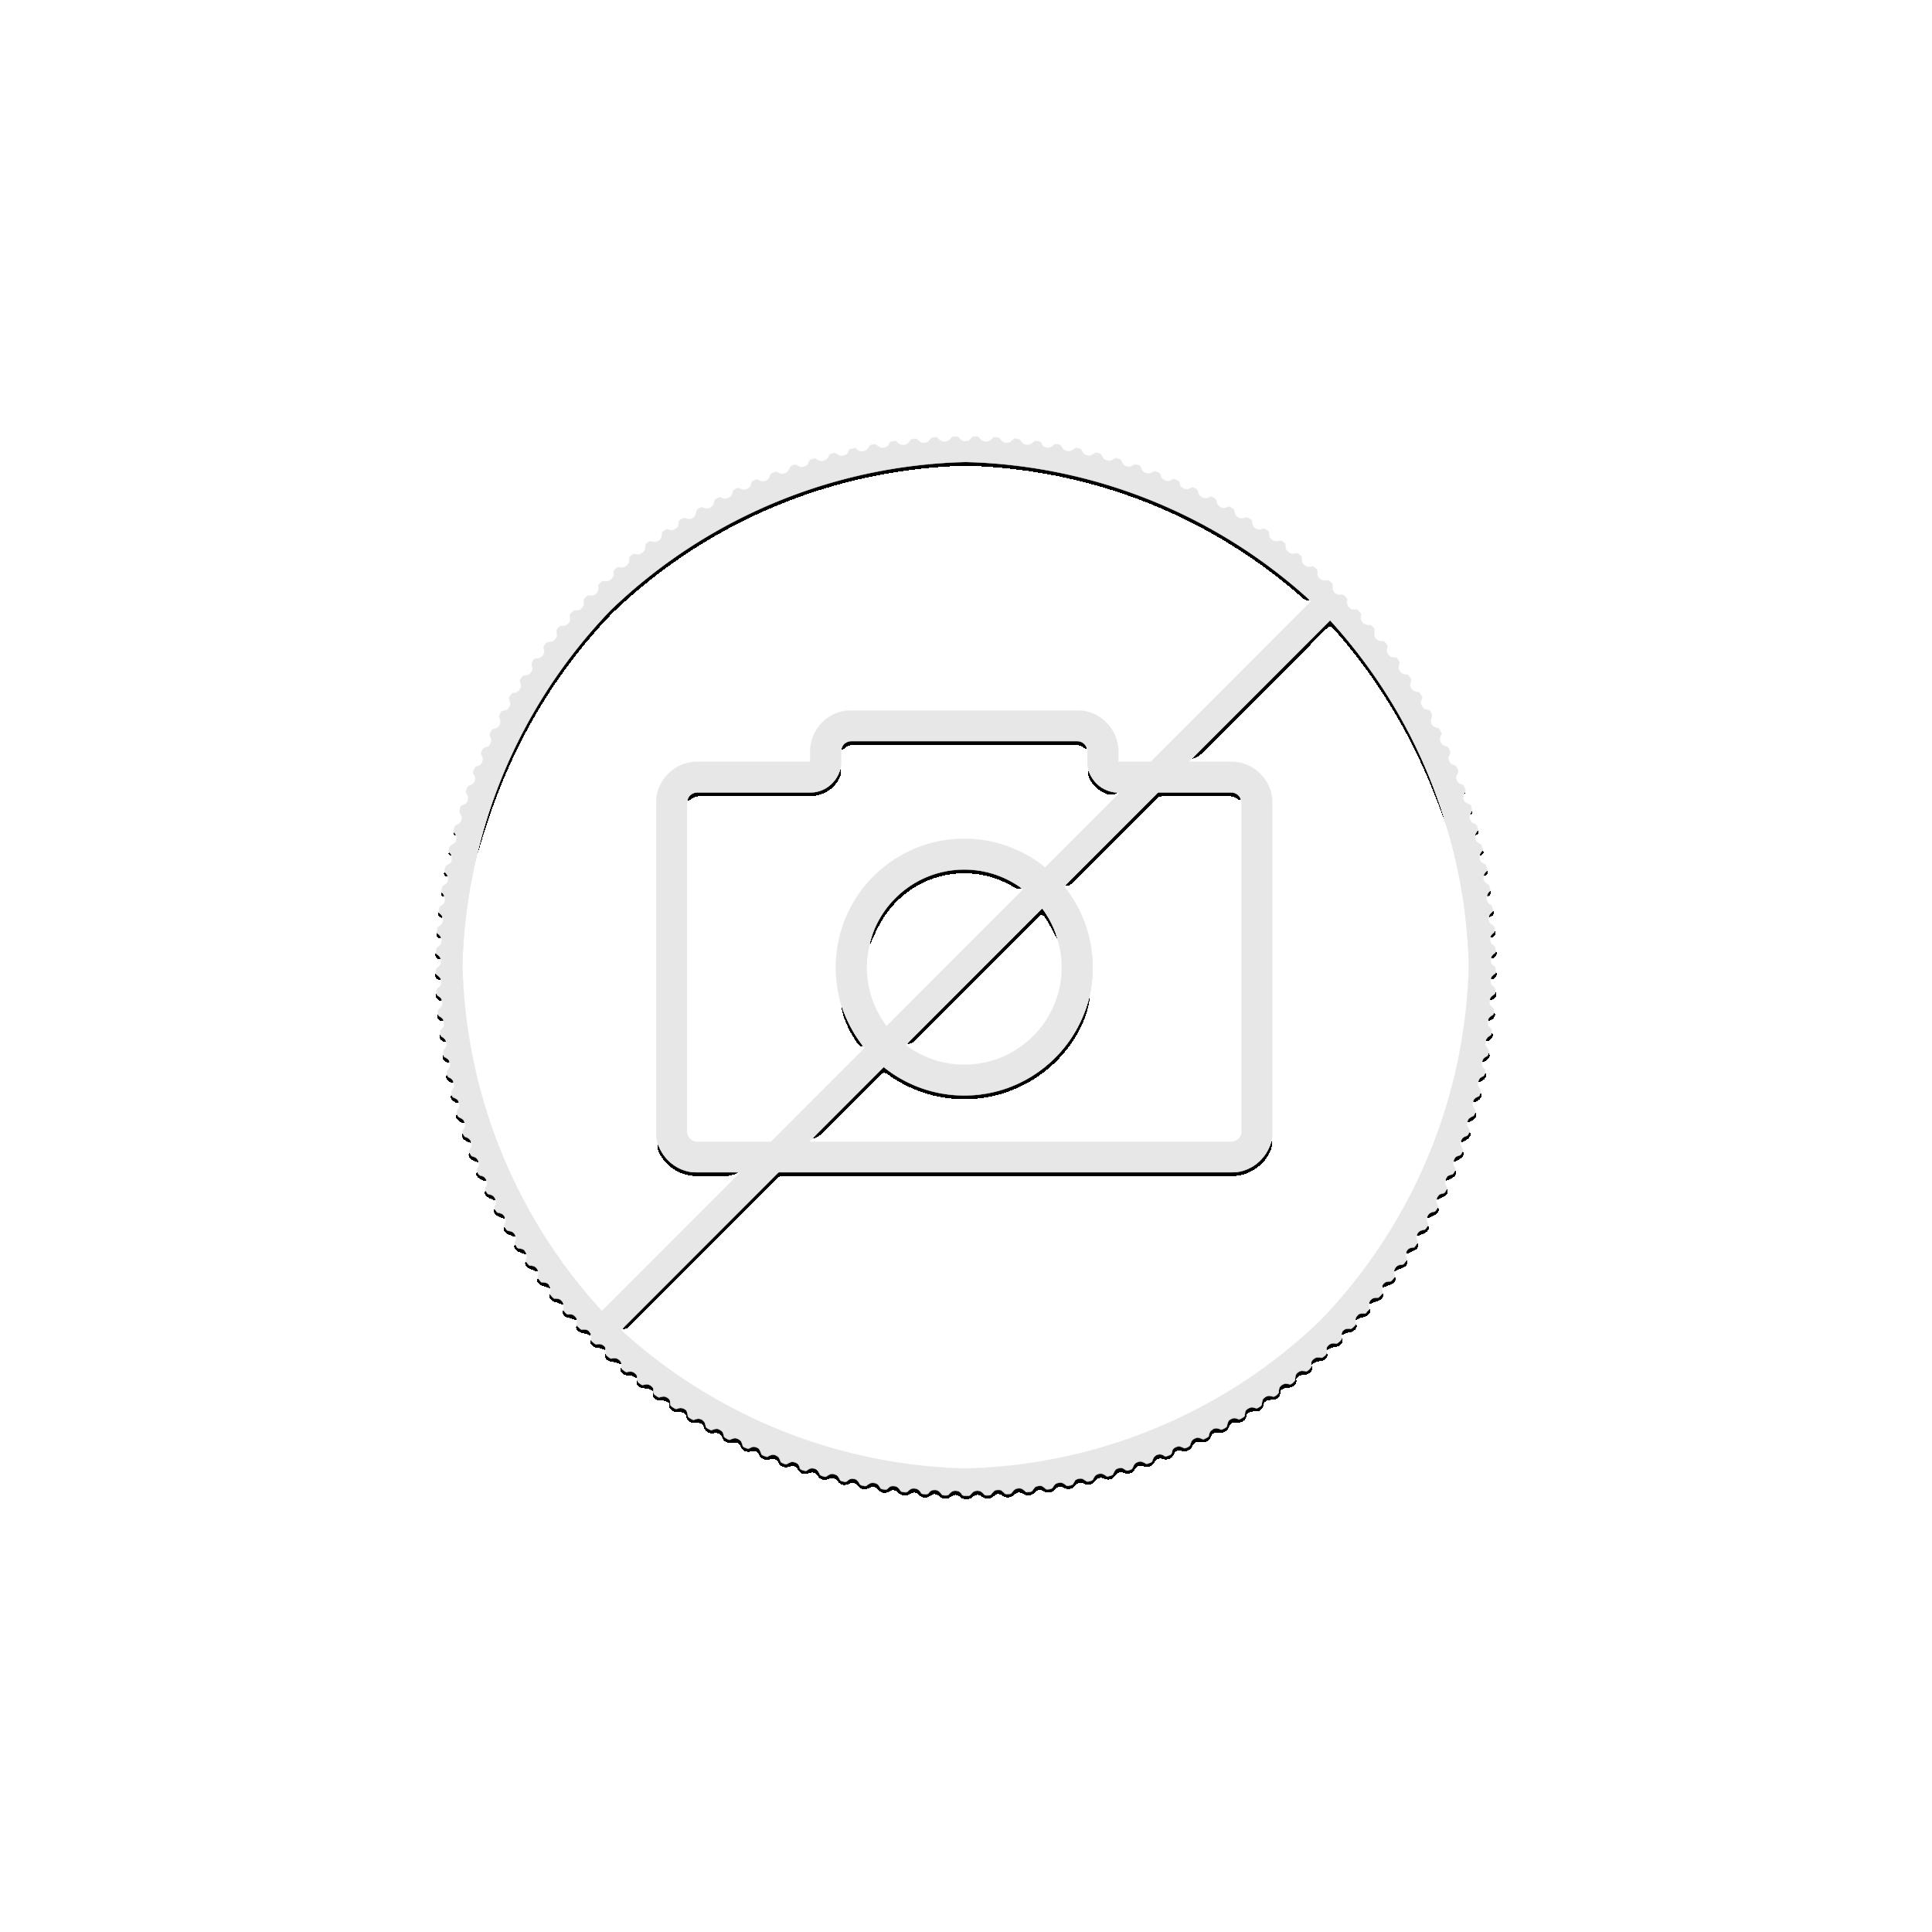 2 Troy ounce silver coin Germania 2021